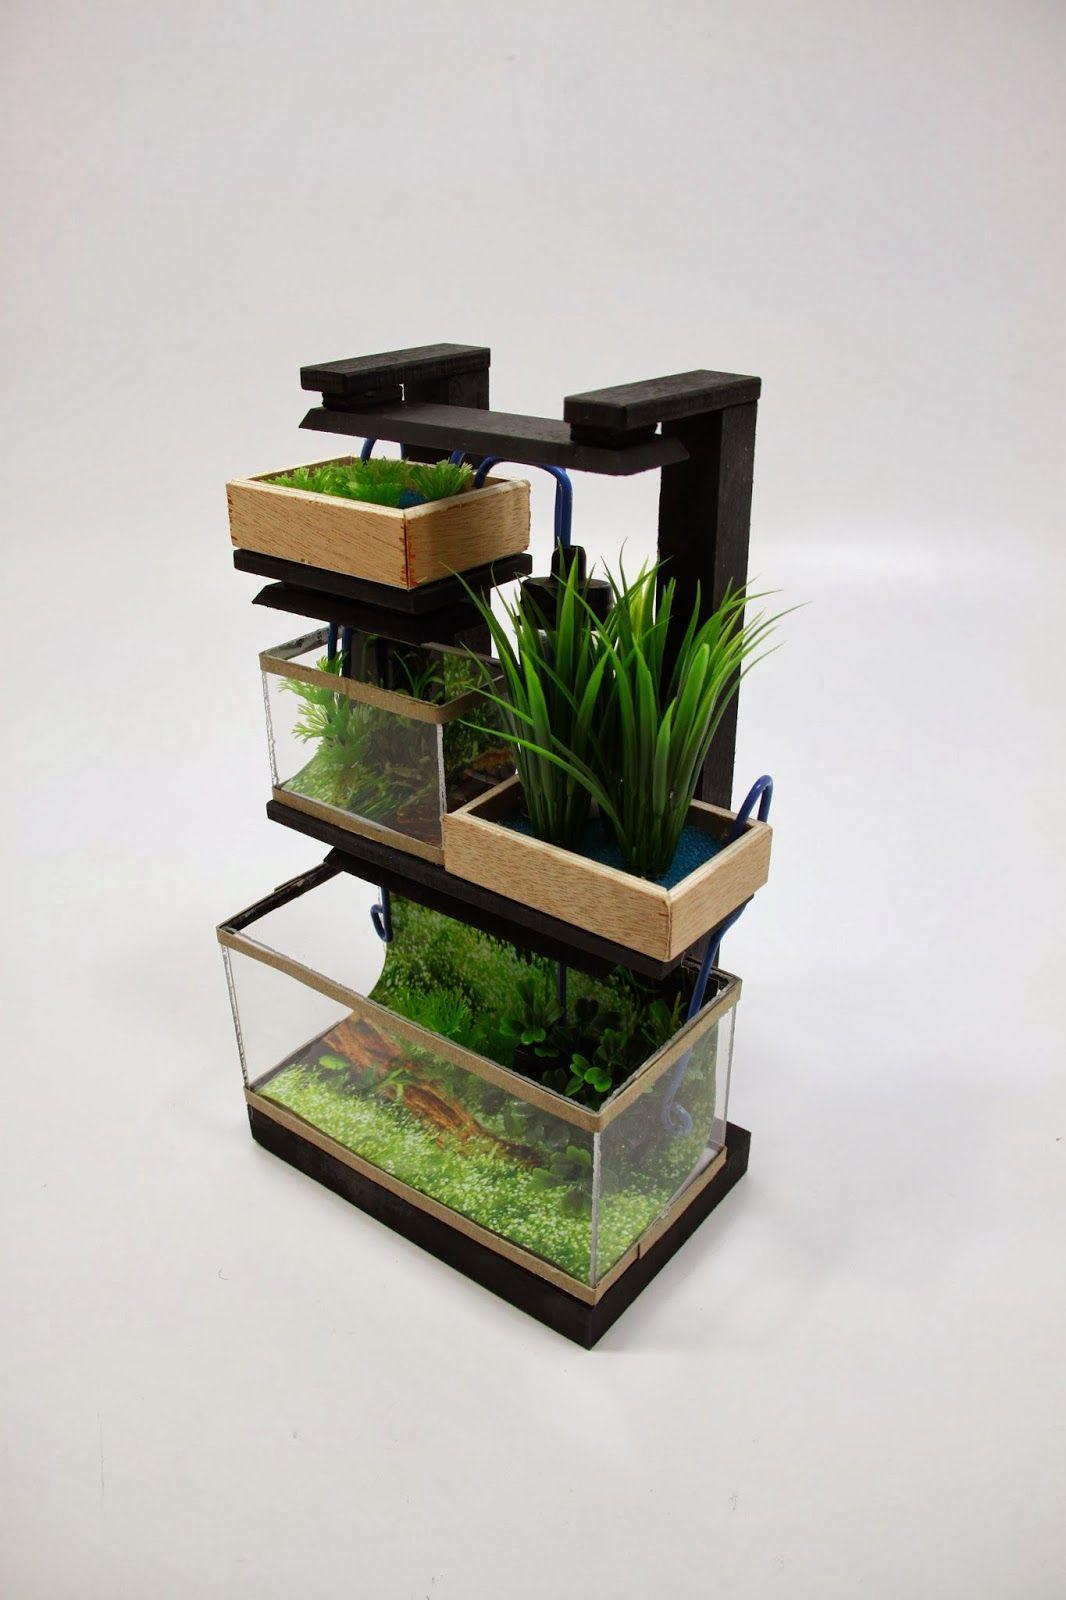 Aquarium aquaponics is hydroponics plus aquaponics for How to grow hydro in a fish tank